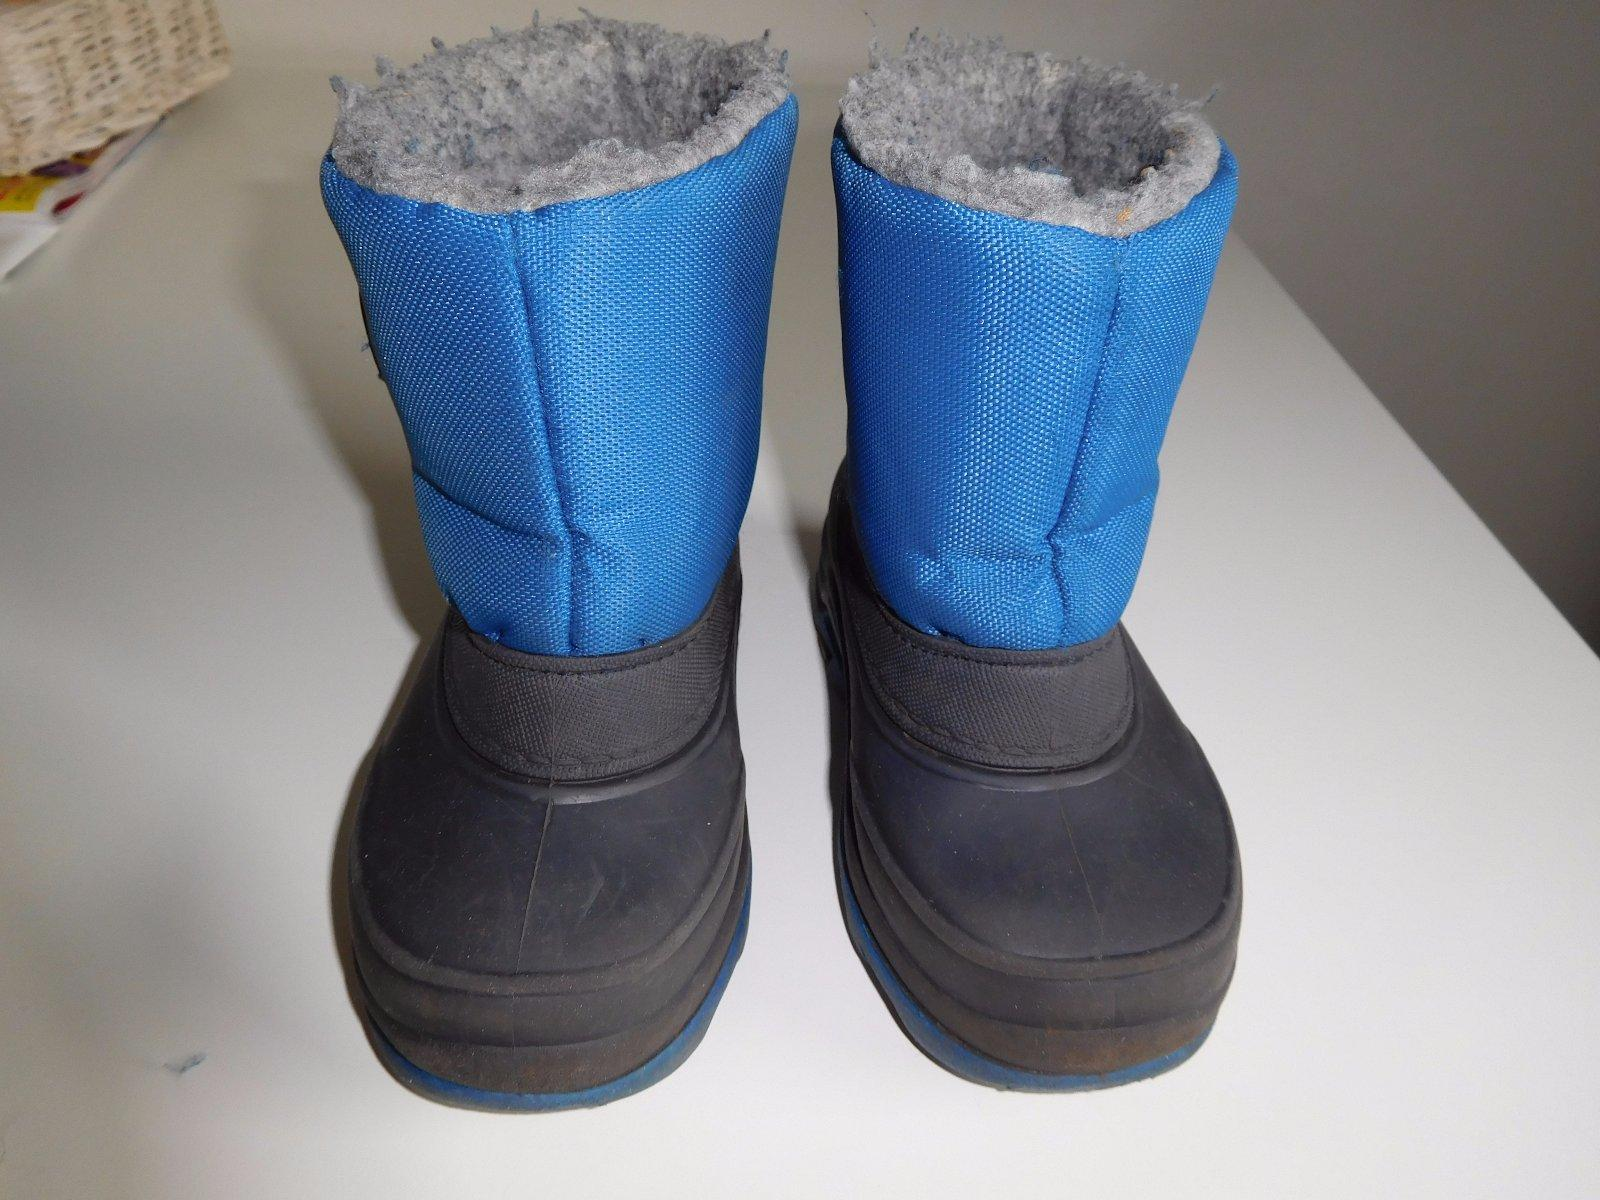 Detské zimné čižmy - snehule mckinley 24-25 1a83230f90